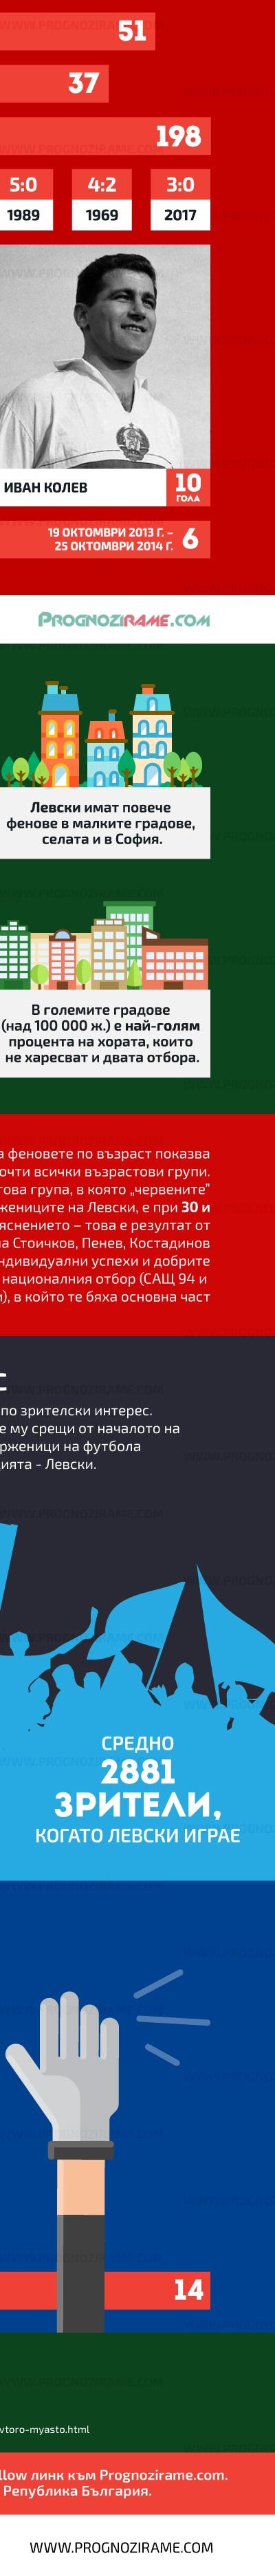 Левски срещу ЦСКА - prognozirame.com [6]